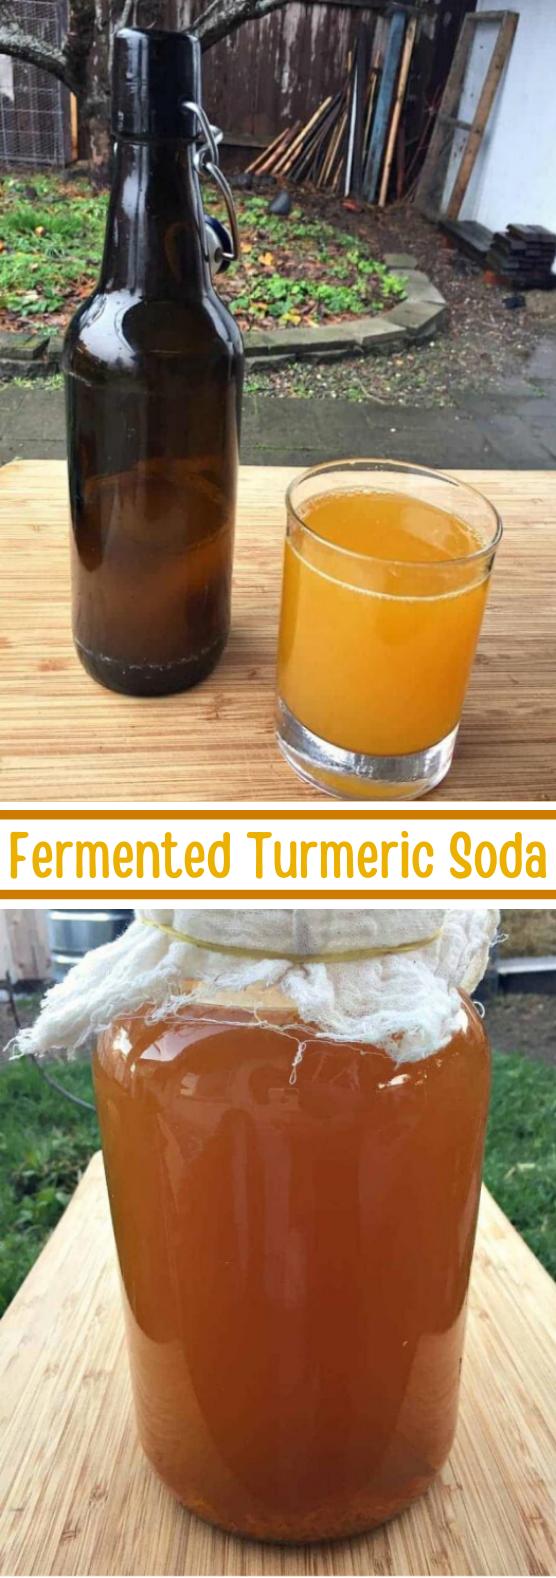 Fermented Turmeric Soda #healthy #drinks #soda #summer #detox